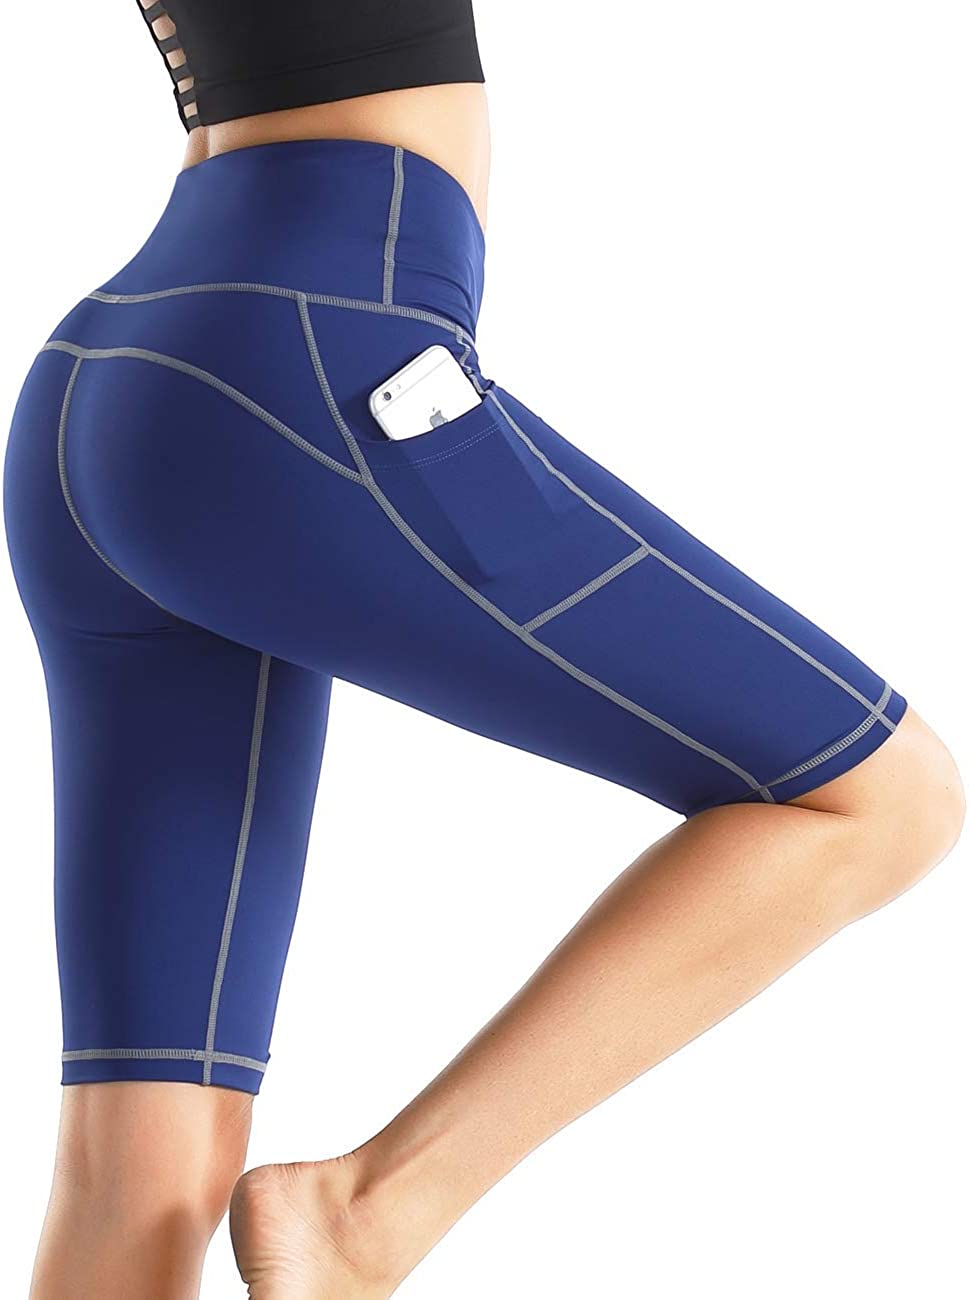 Rocorose Womens Shorts Tummy Control High Waist Butt Lifting Workout Biker Yoga Shorts with Side Pockets